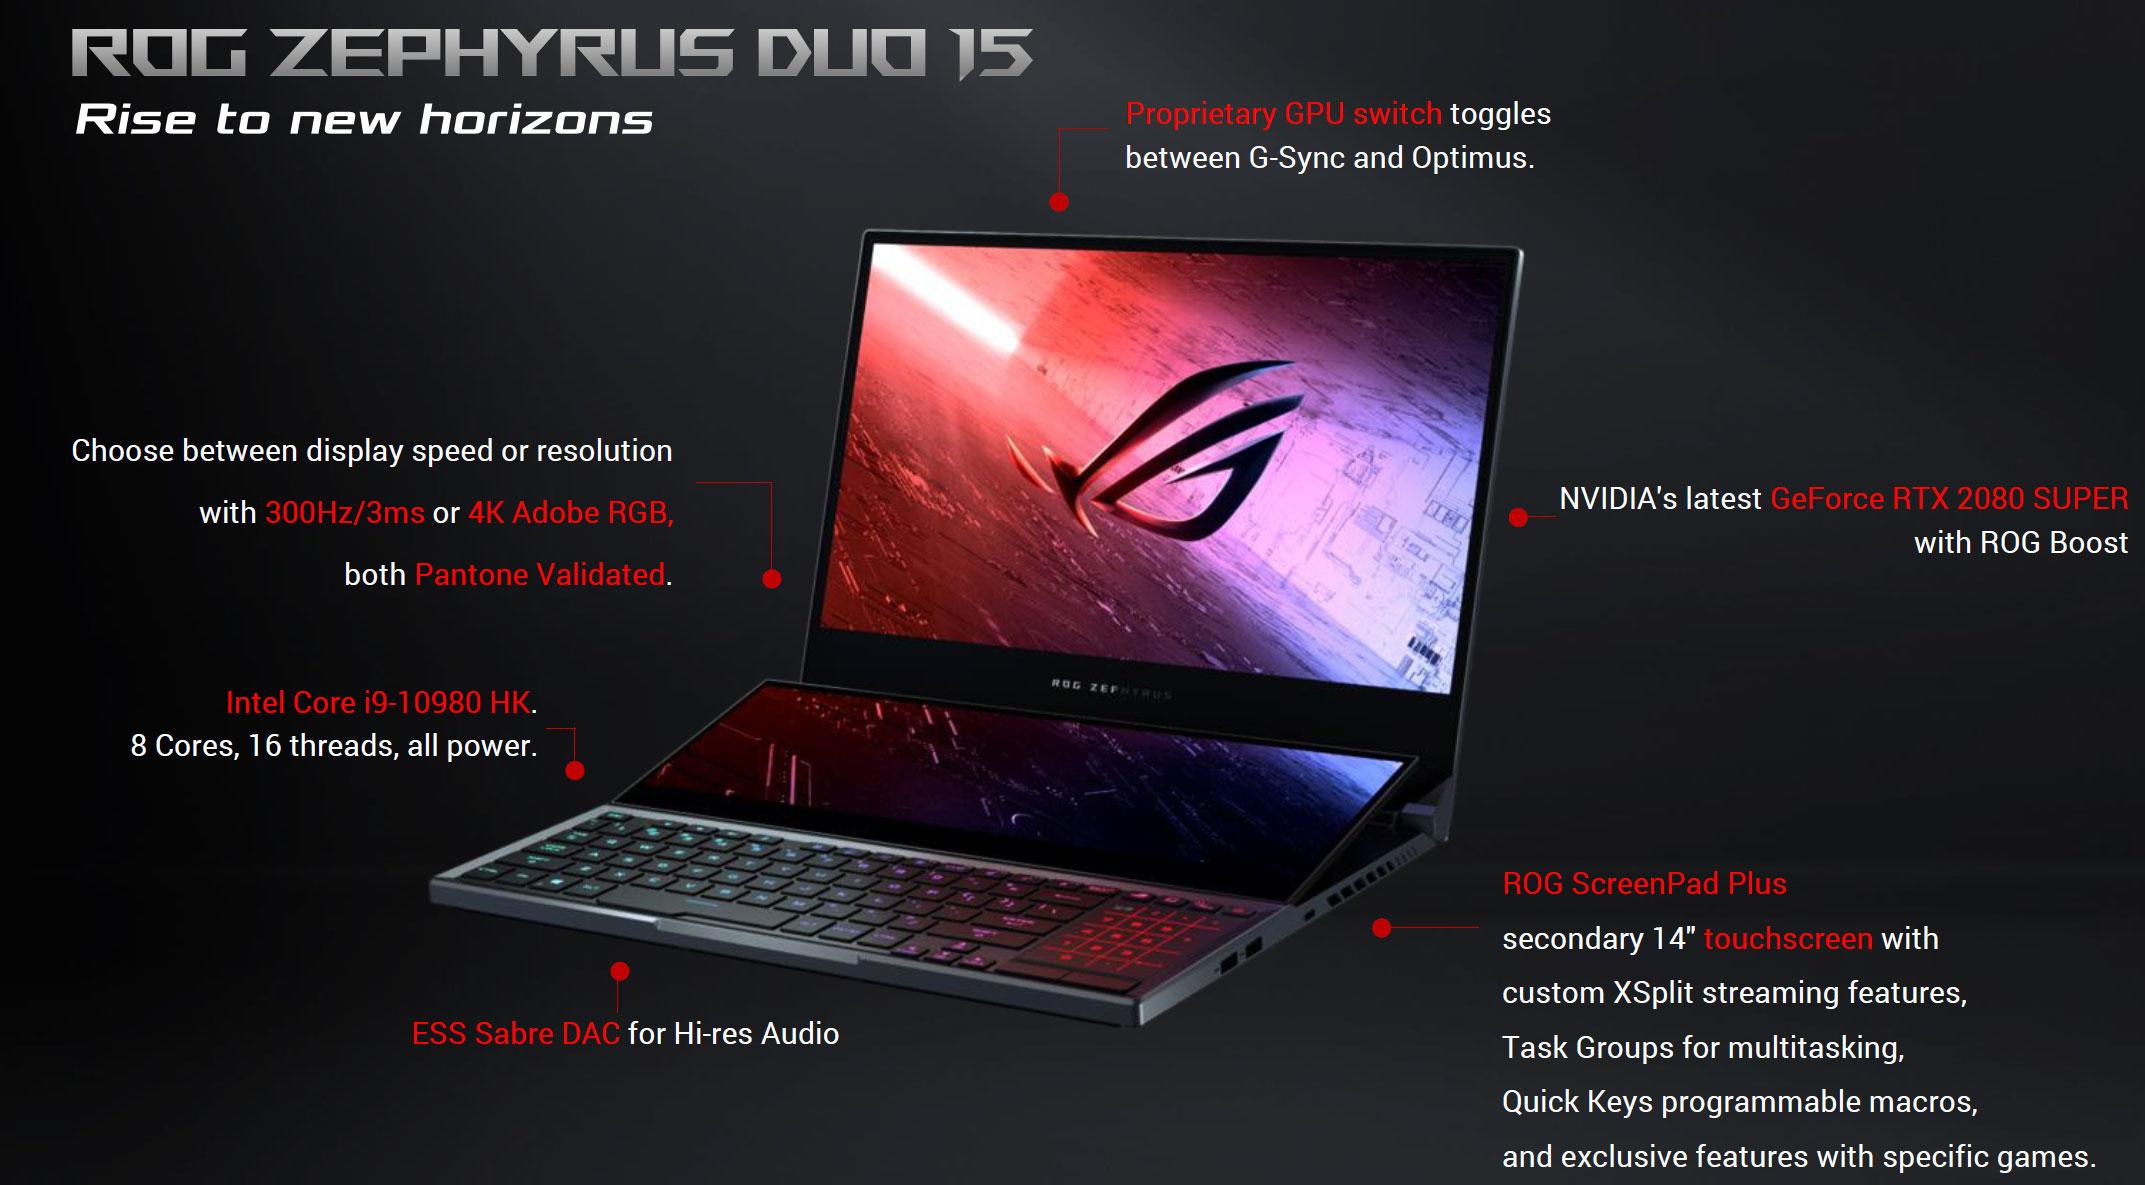 Asus ROG Zephyrus Duo GX550 summary